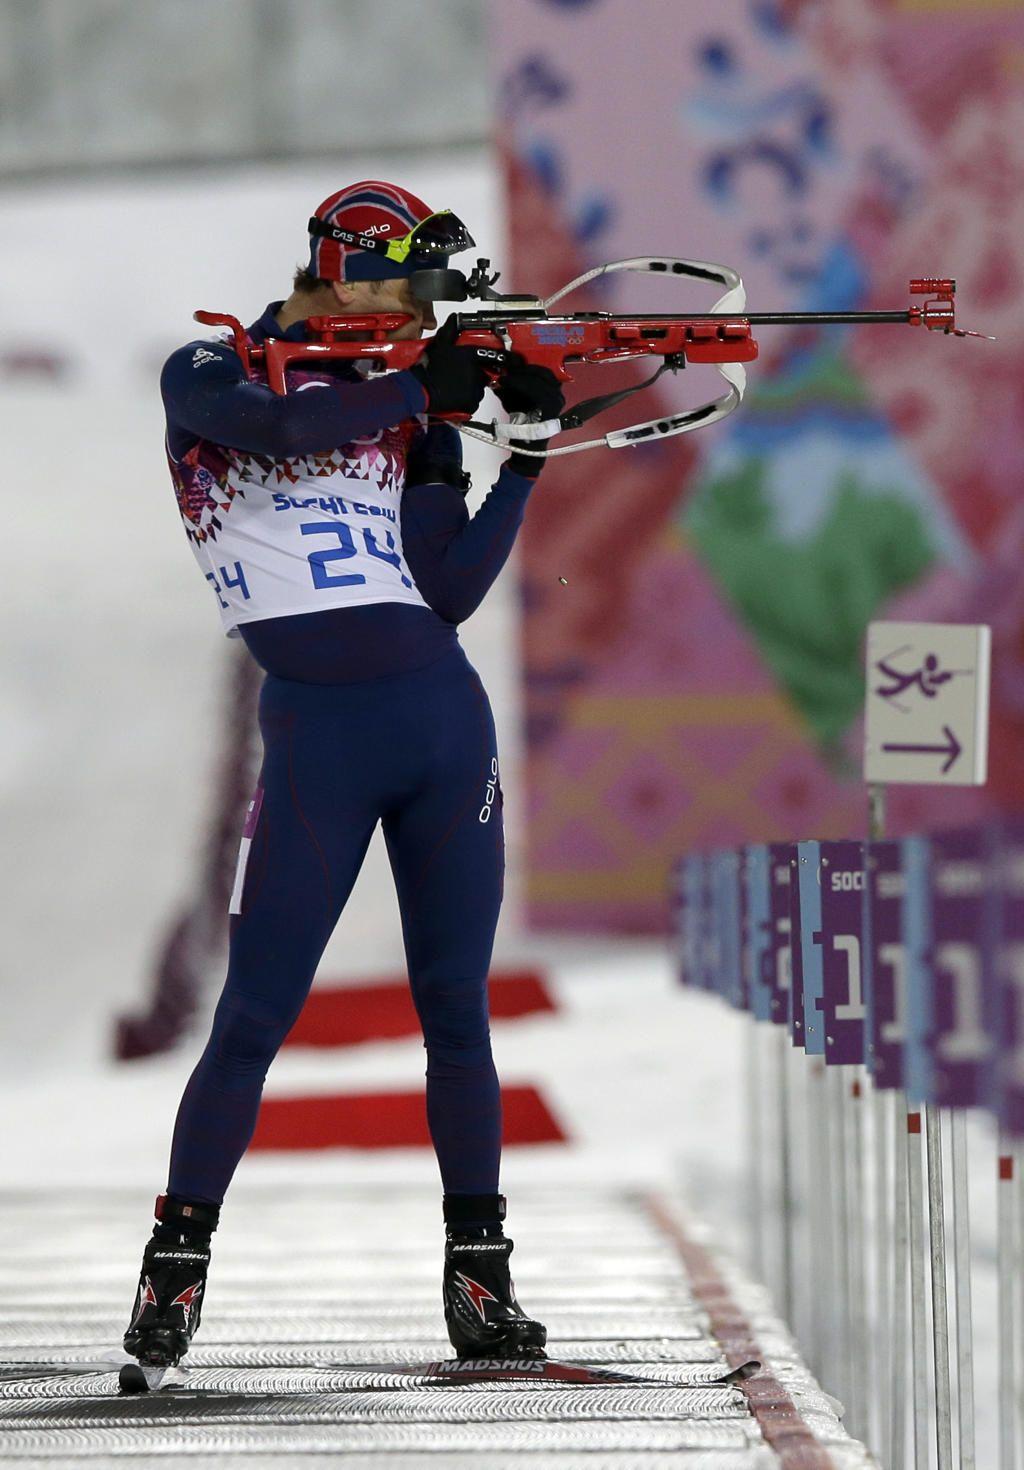 nike free run 2 womens 7 5 biathlon